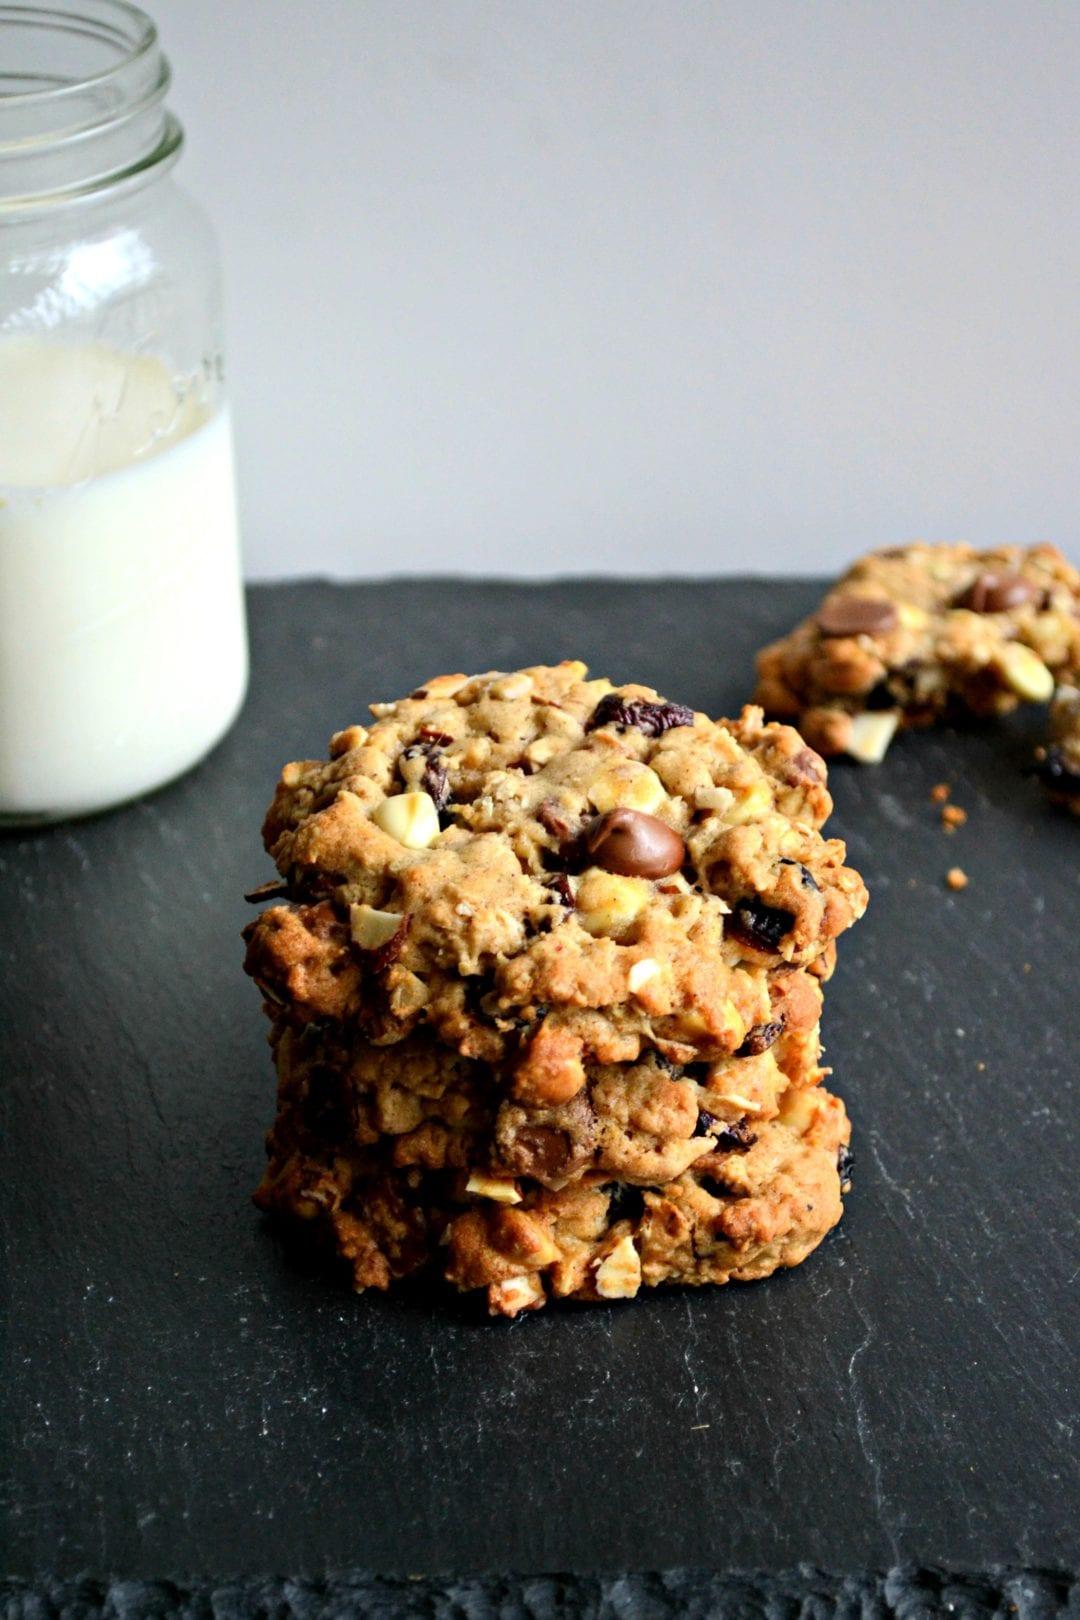 Copycat whole foods jumble nut cookies sarcastic cooking copycat whole foods jumble nut cookies sarcastic cooking forumfinder Images